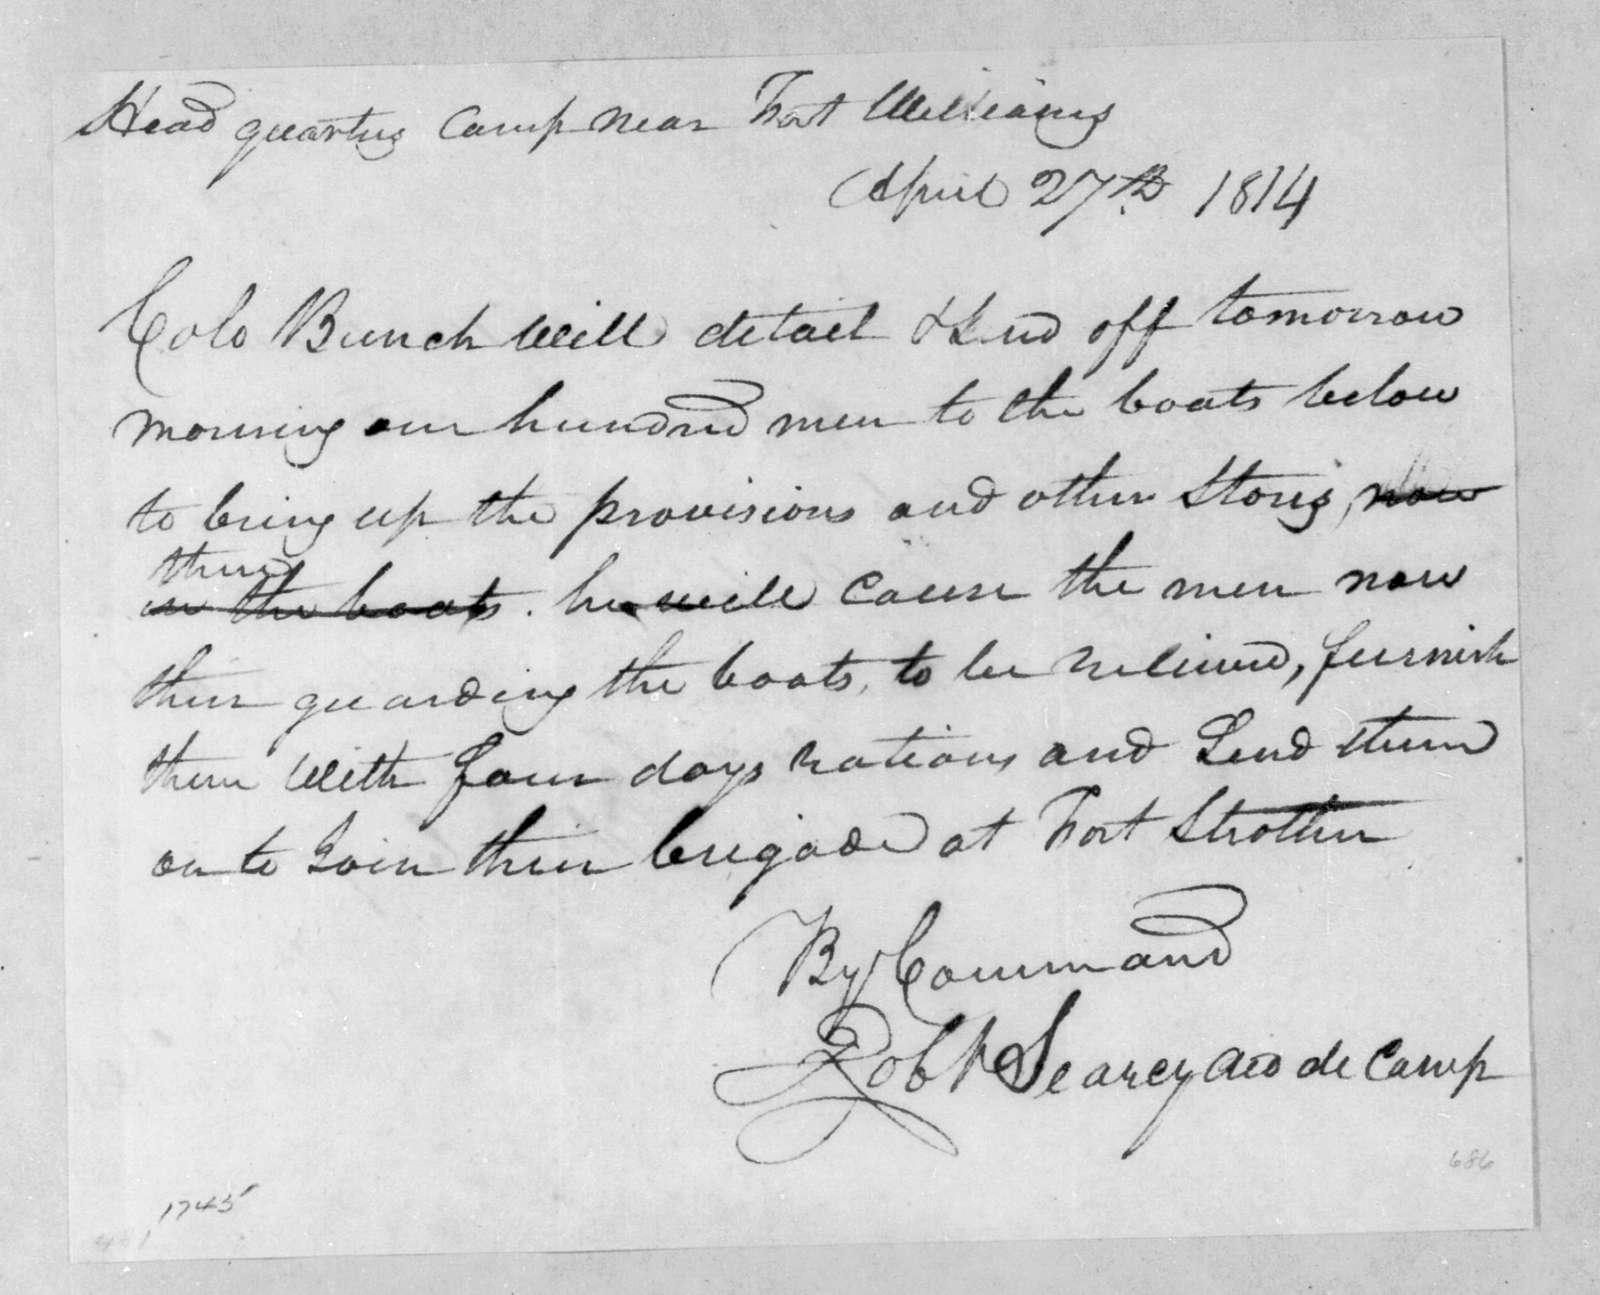 Robert Searcy to Samuel Bunch, April 27, 1814